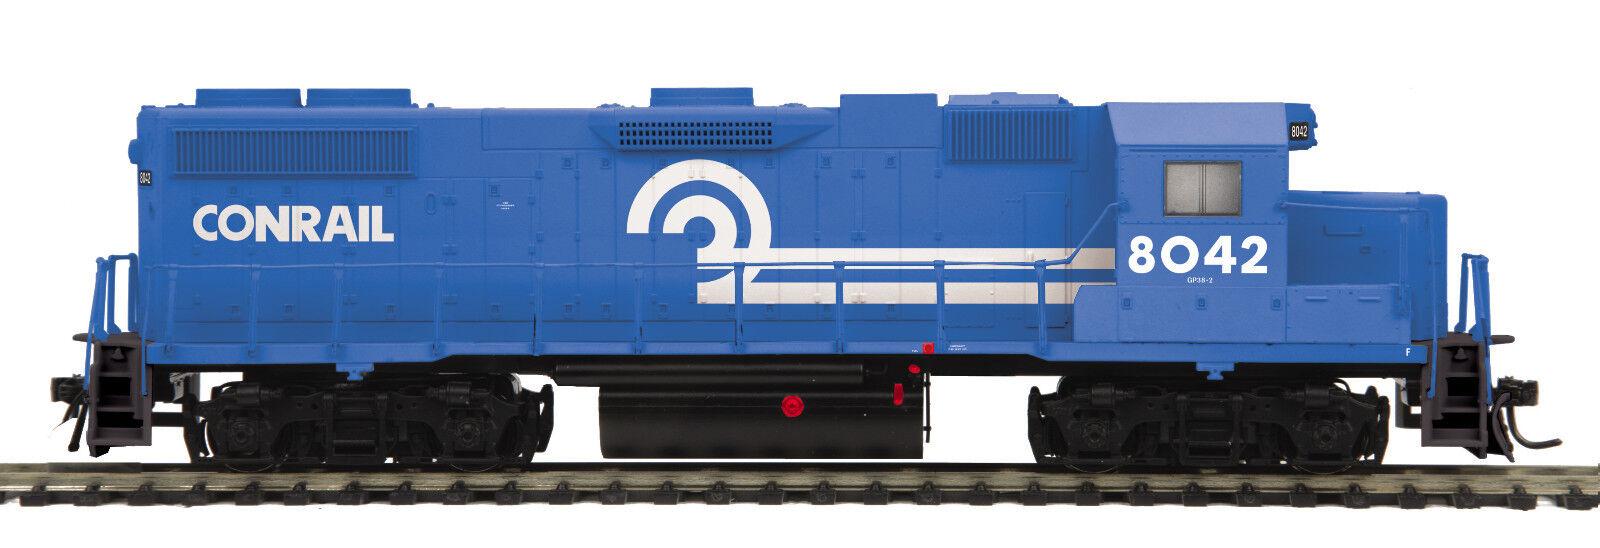 MTH HO Contjärnväg GP38 -2 DCC Ready Engine 85 -2045 -0